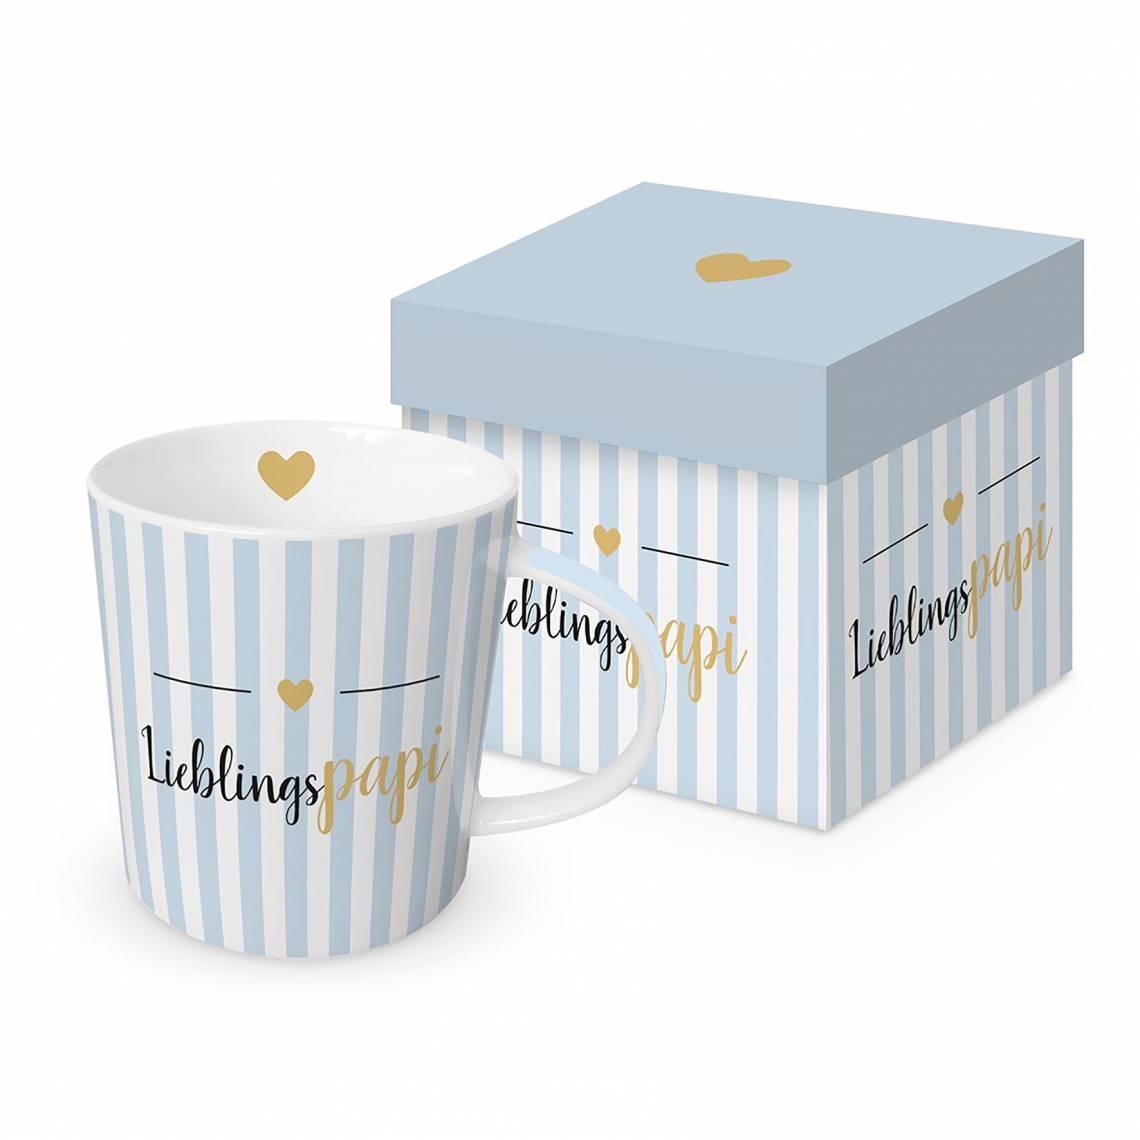 PPD 604358· Lieblingspapi Trend Mug Gift Box